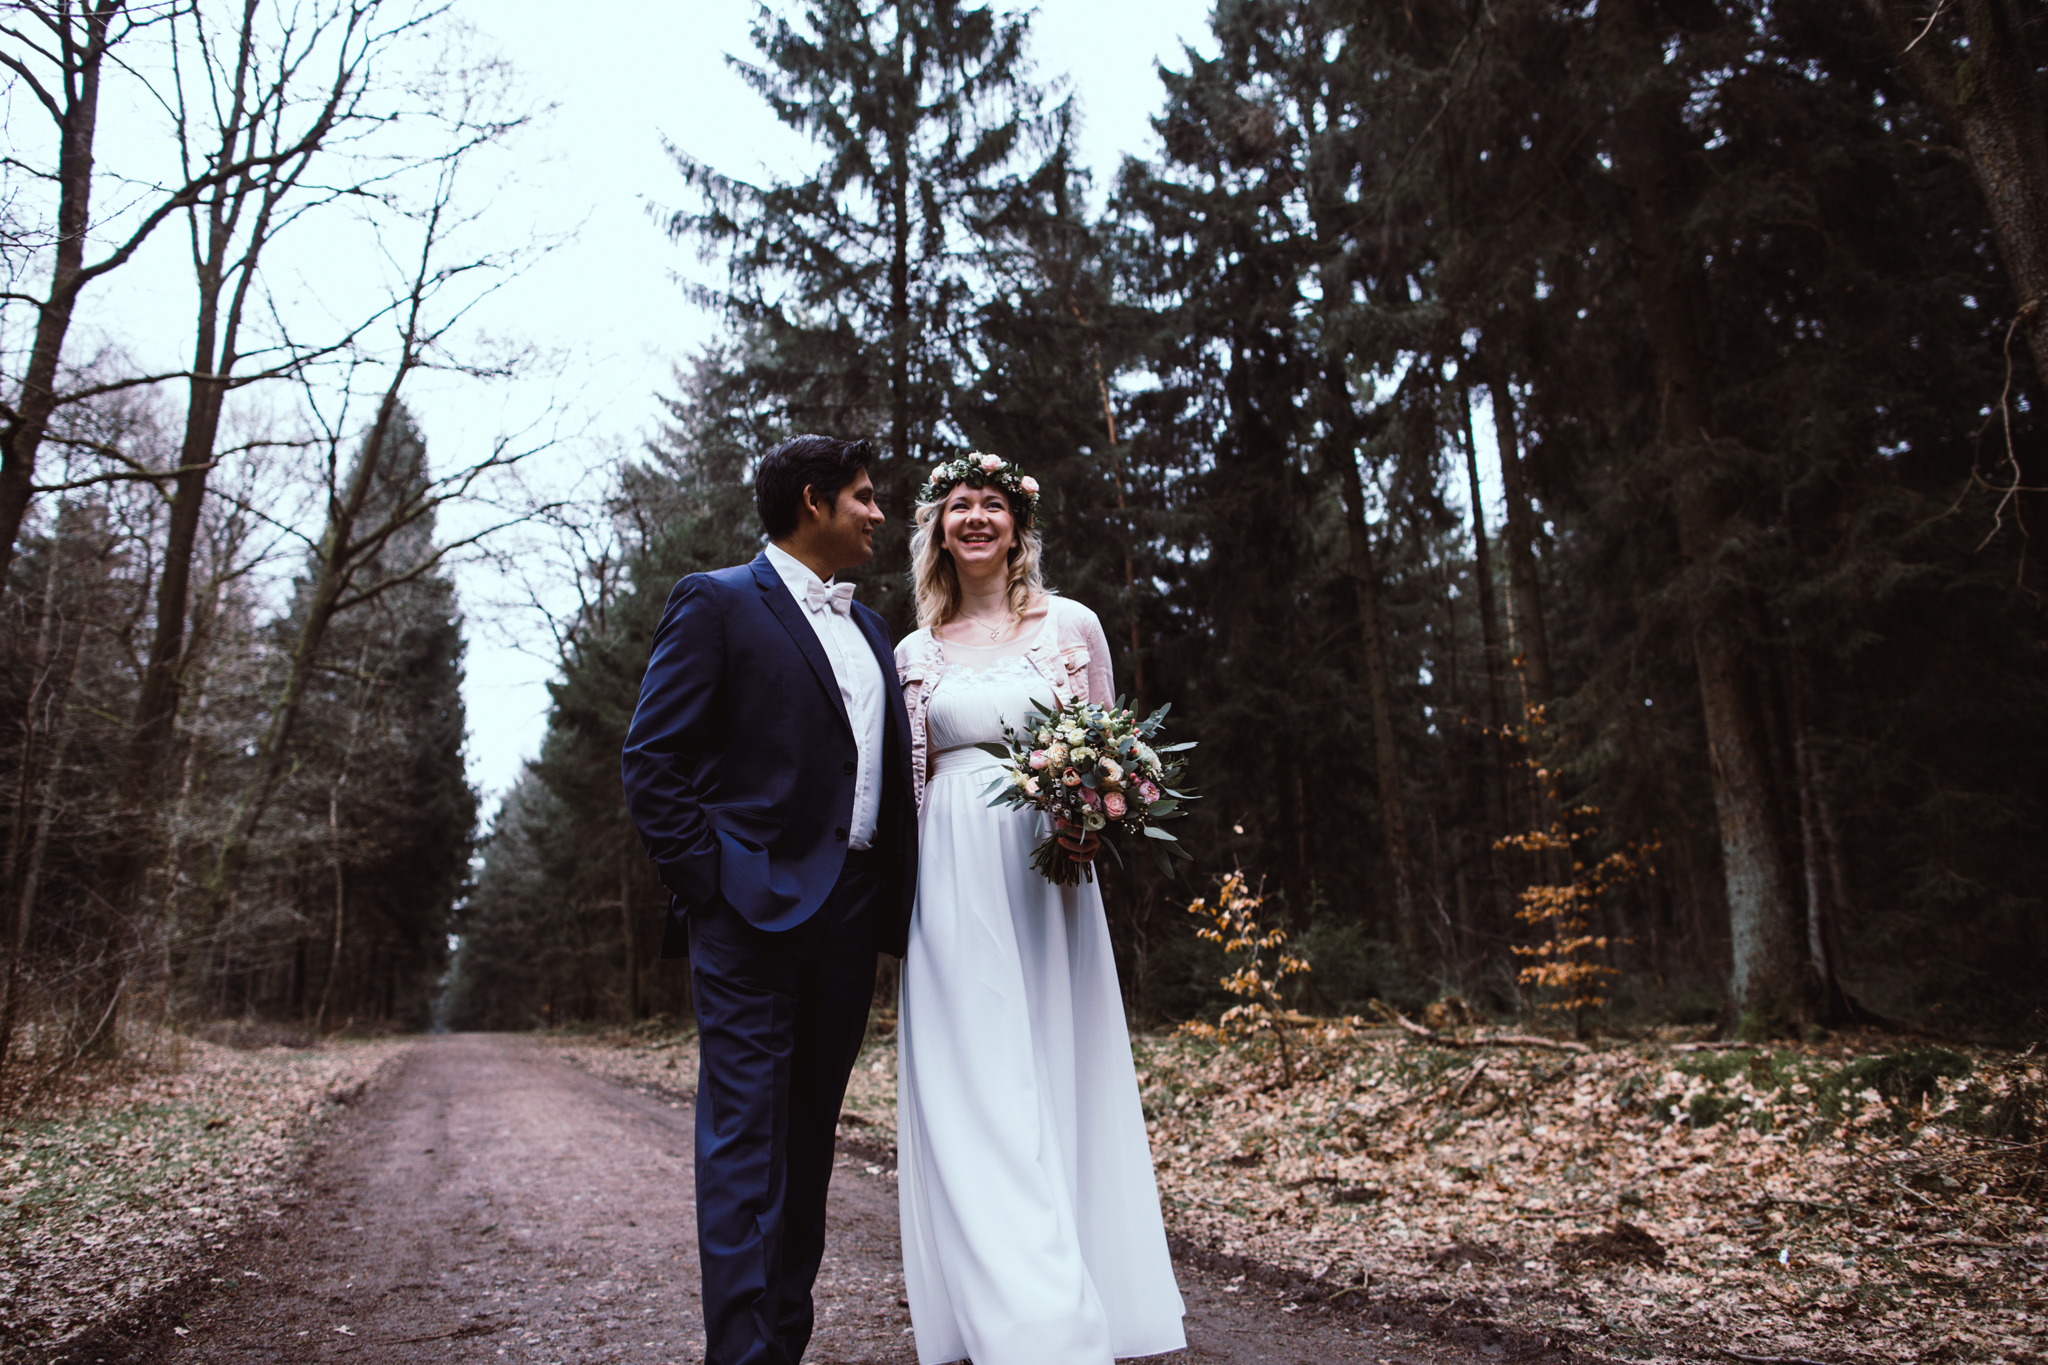 Brautpaar im Wald Brautpaarshooting